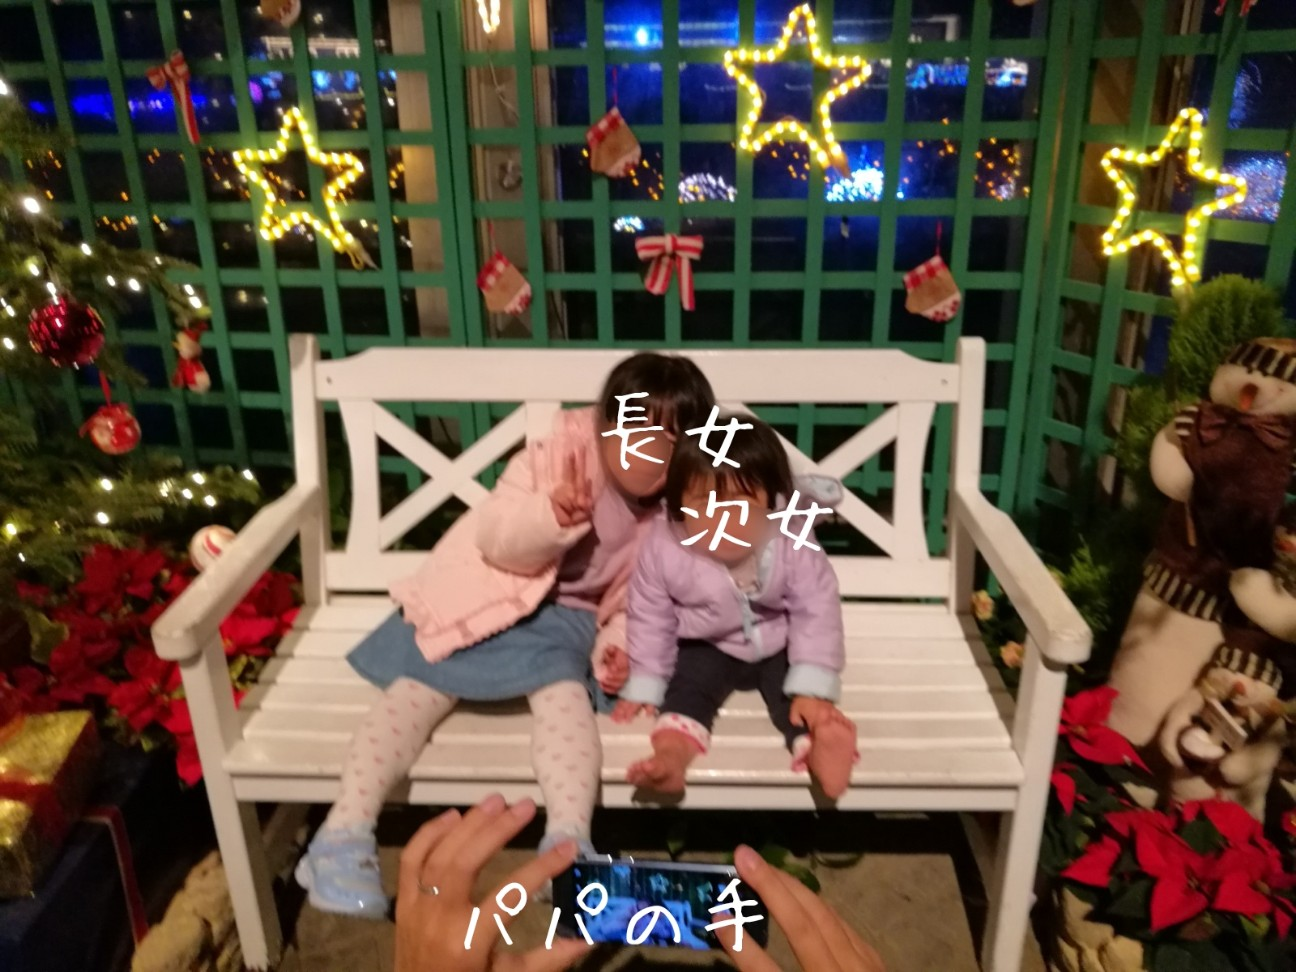 f:id:kodomo-to-dokoiko:20171128003837j:image